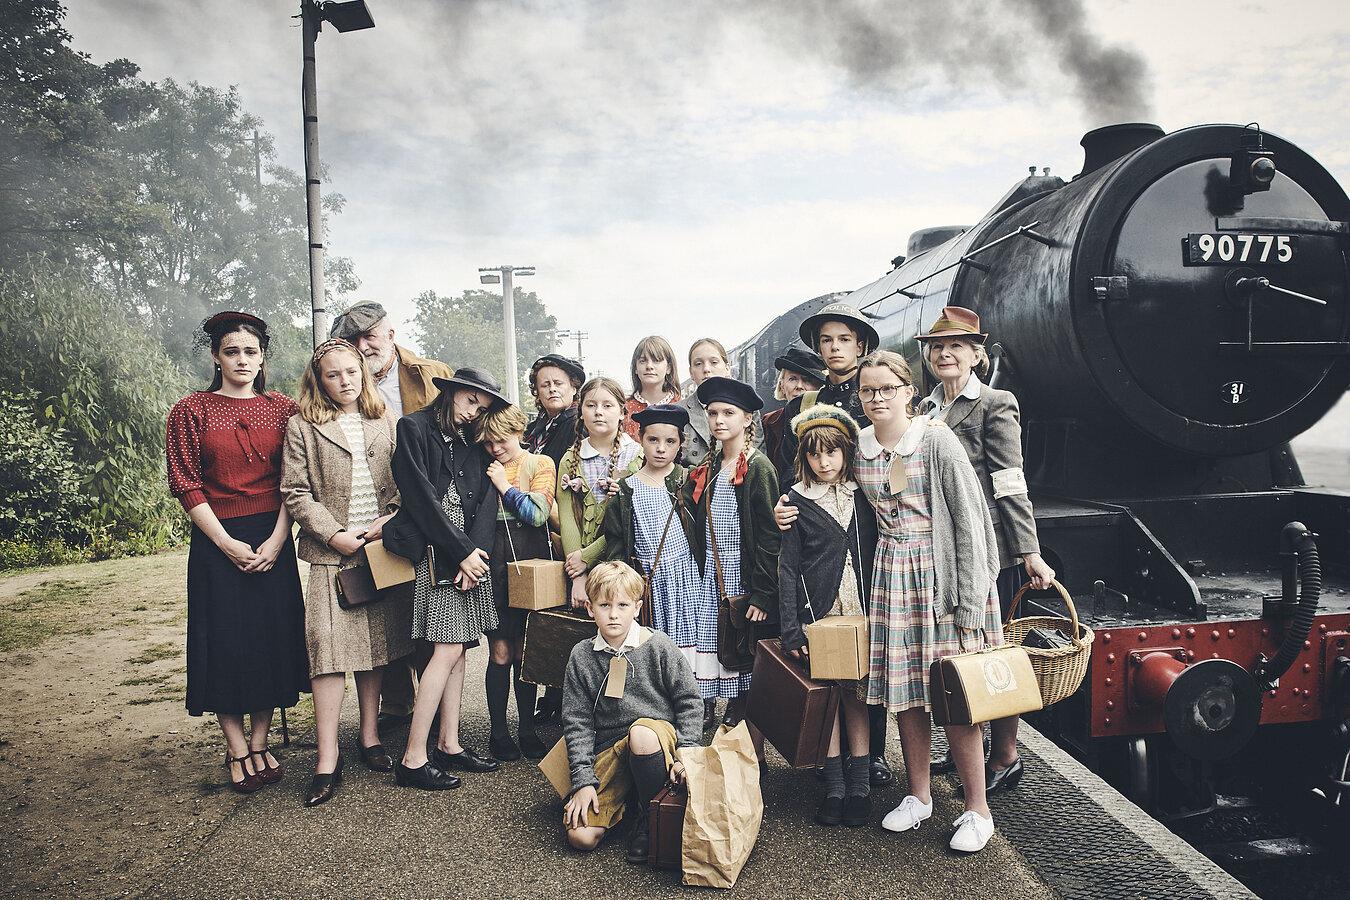 Sheringham Little Theatre- wartime play cast